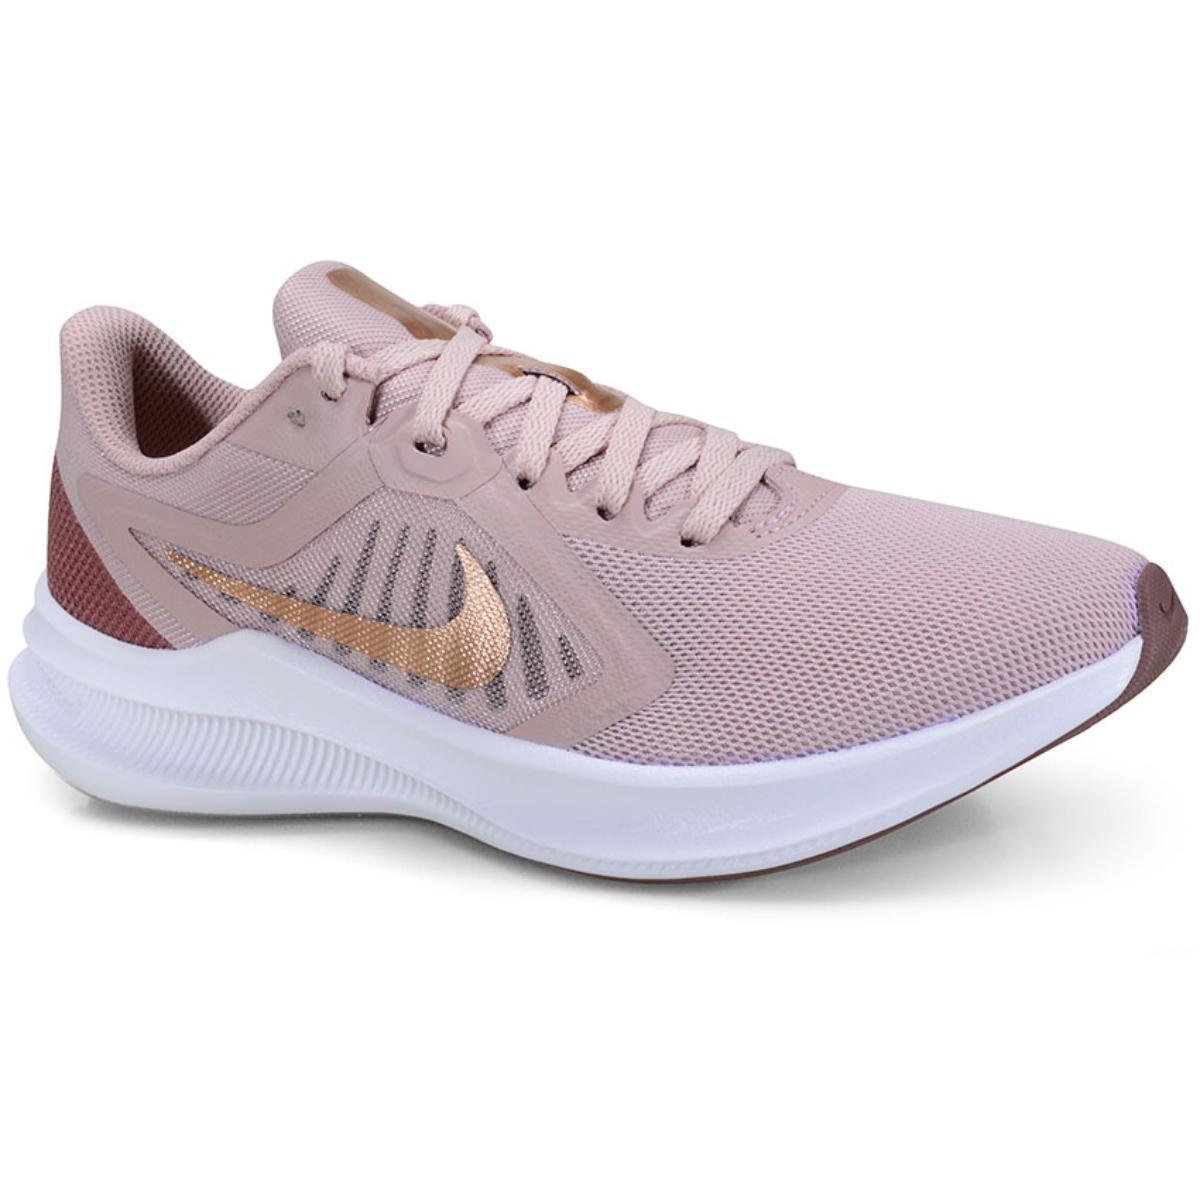 Tênis Feminino Nike Ci9984-200 Downshifter 10 Rose